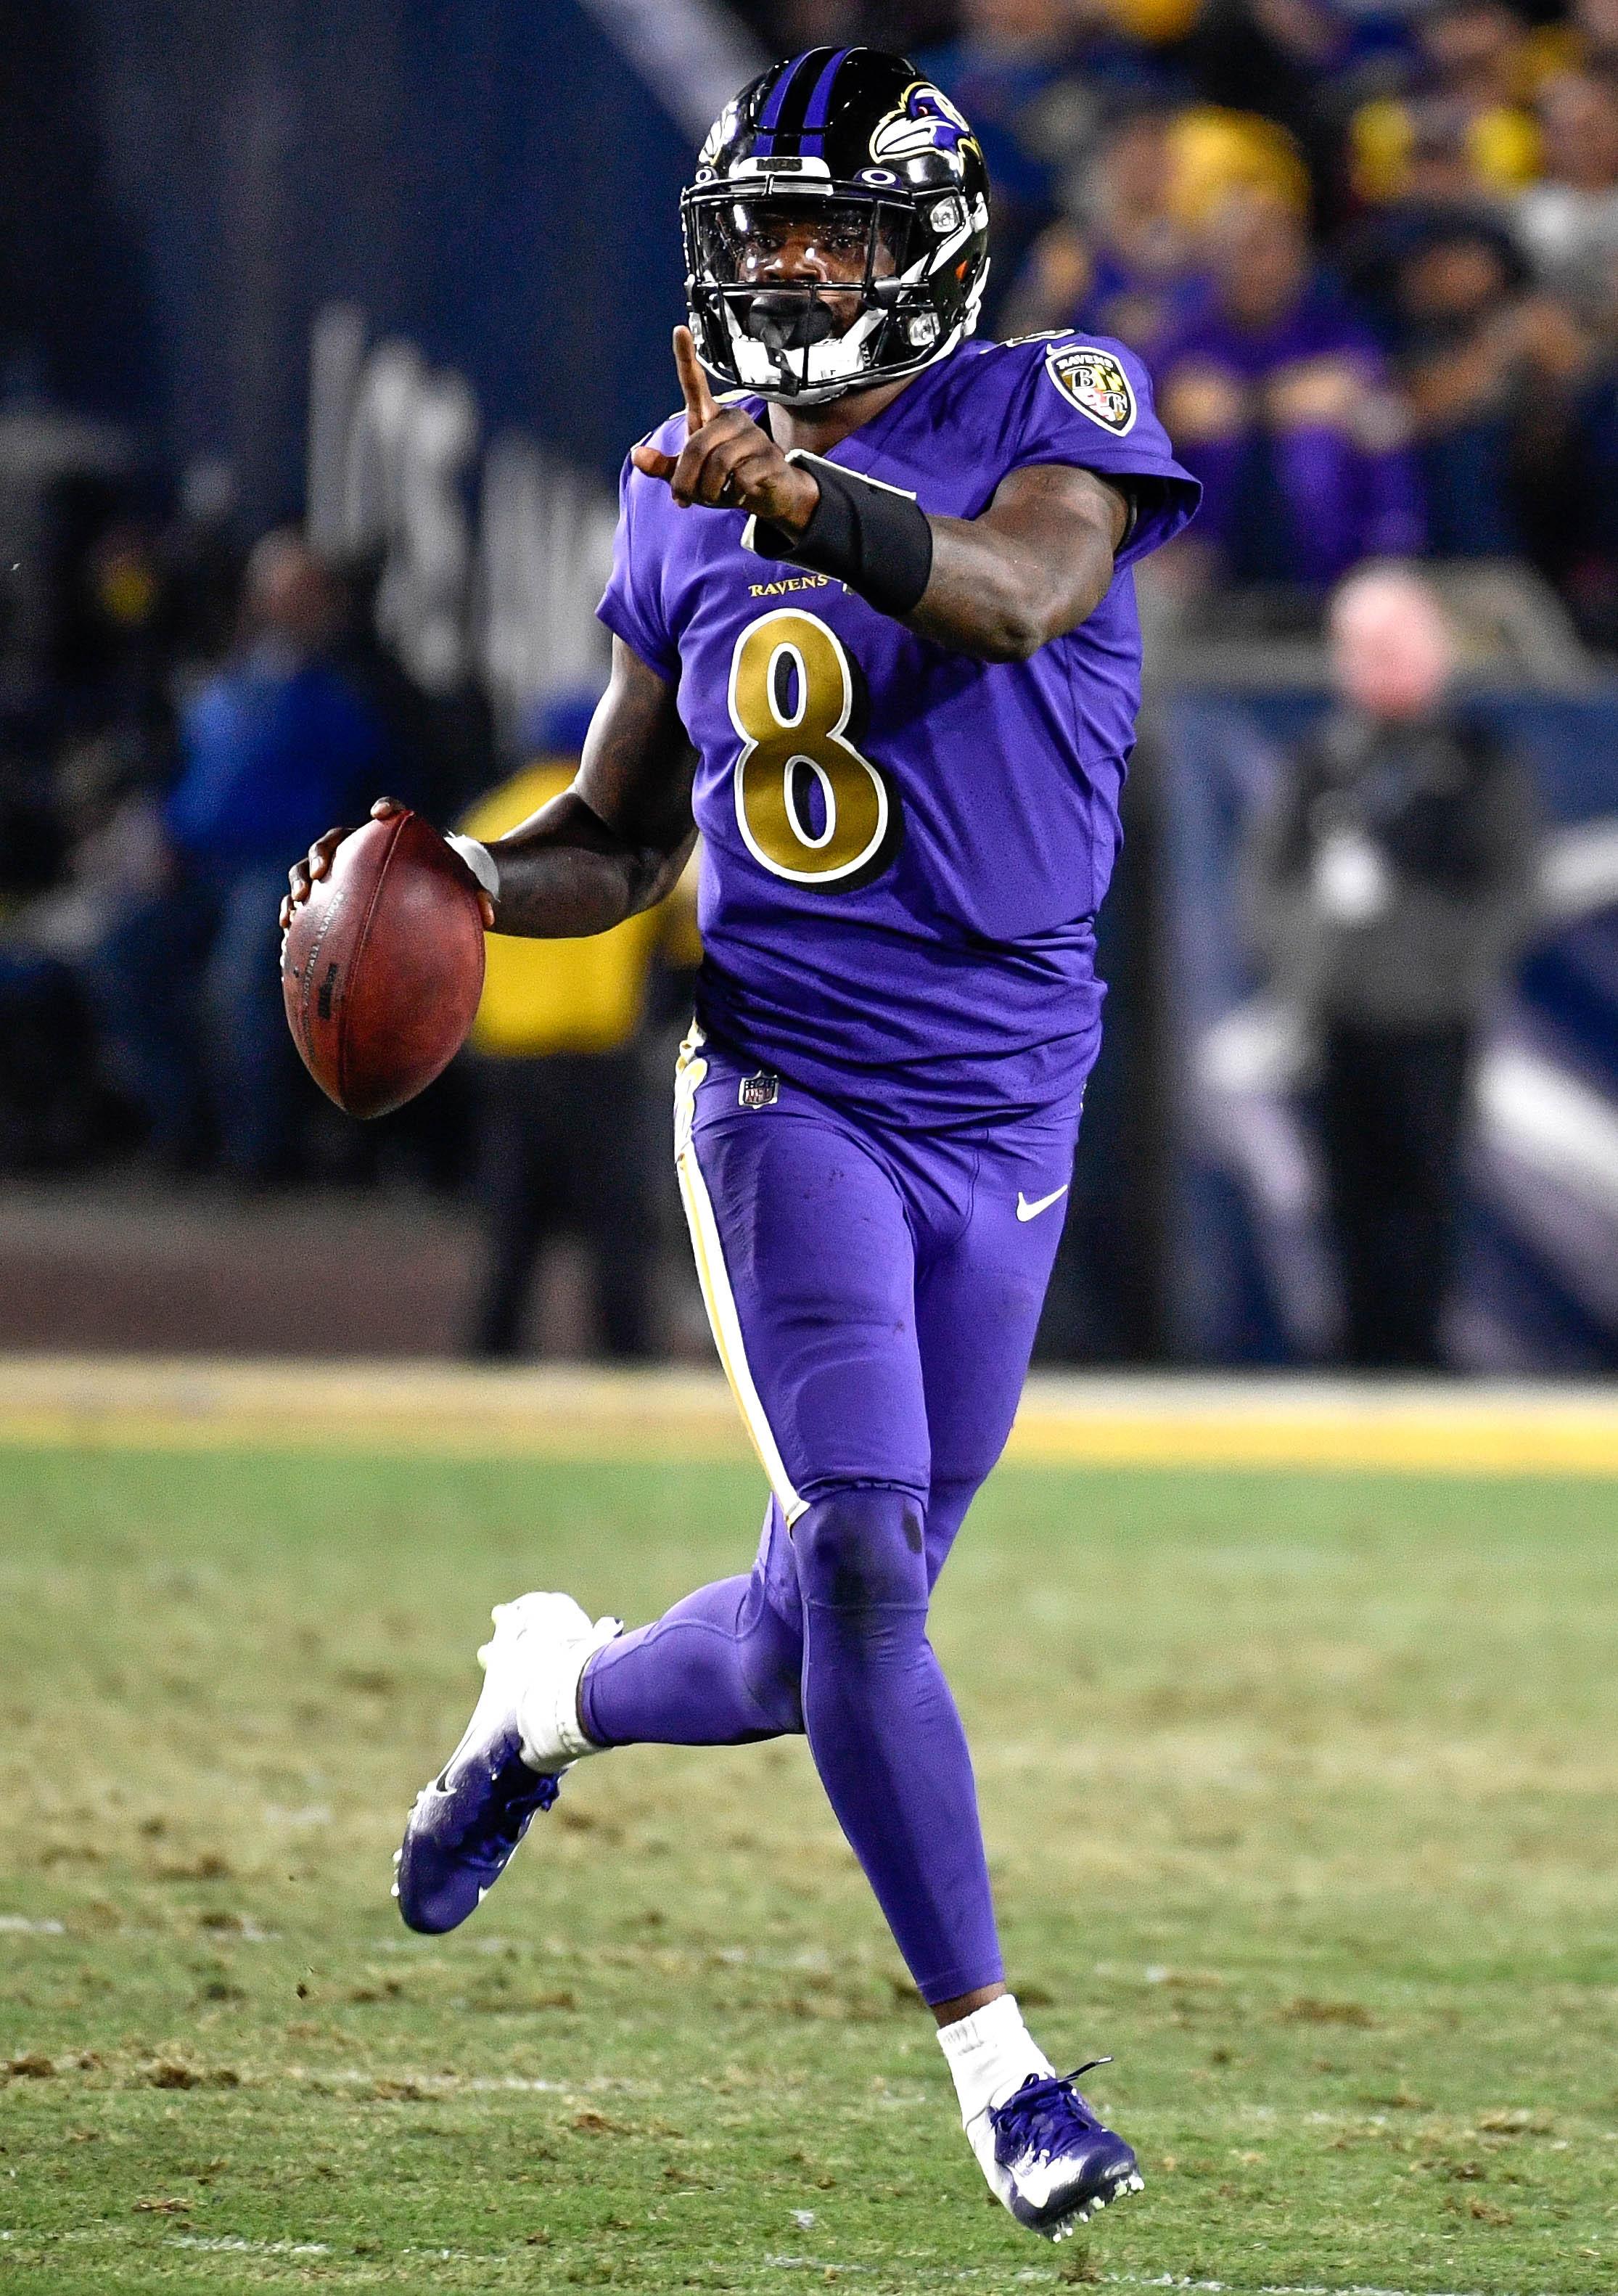 NFL: Baltimore Ravens at Los Angeles Rams